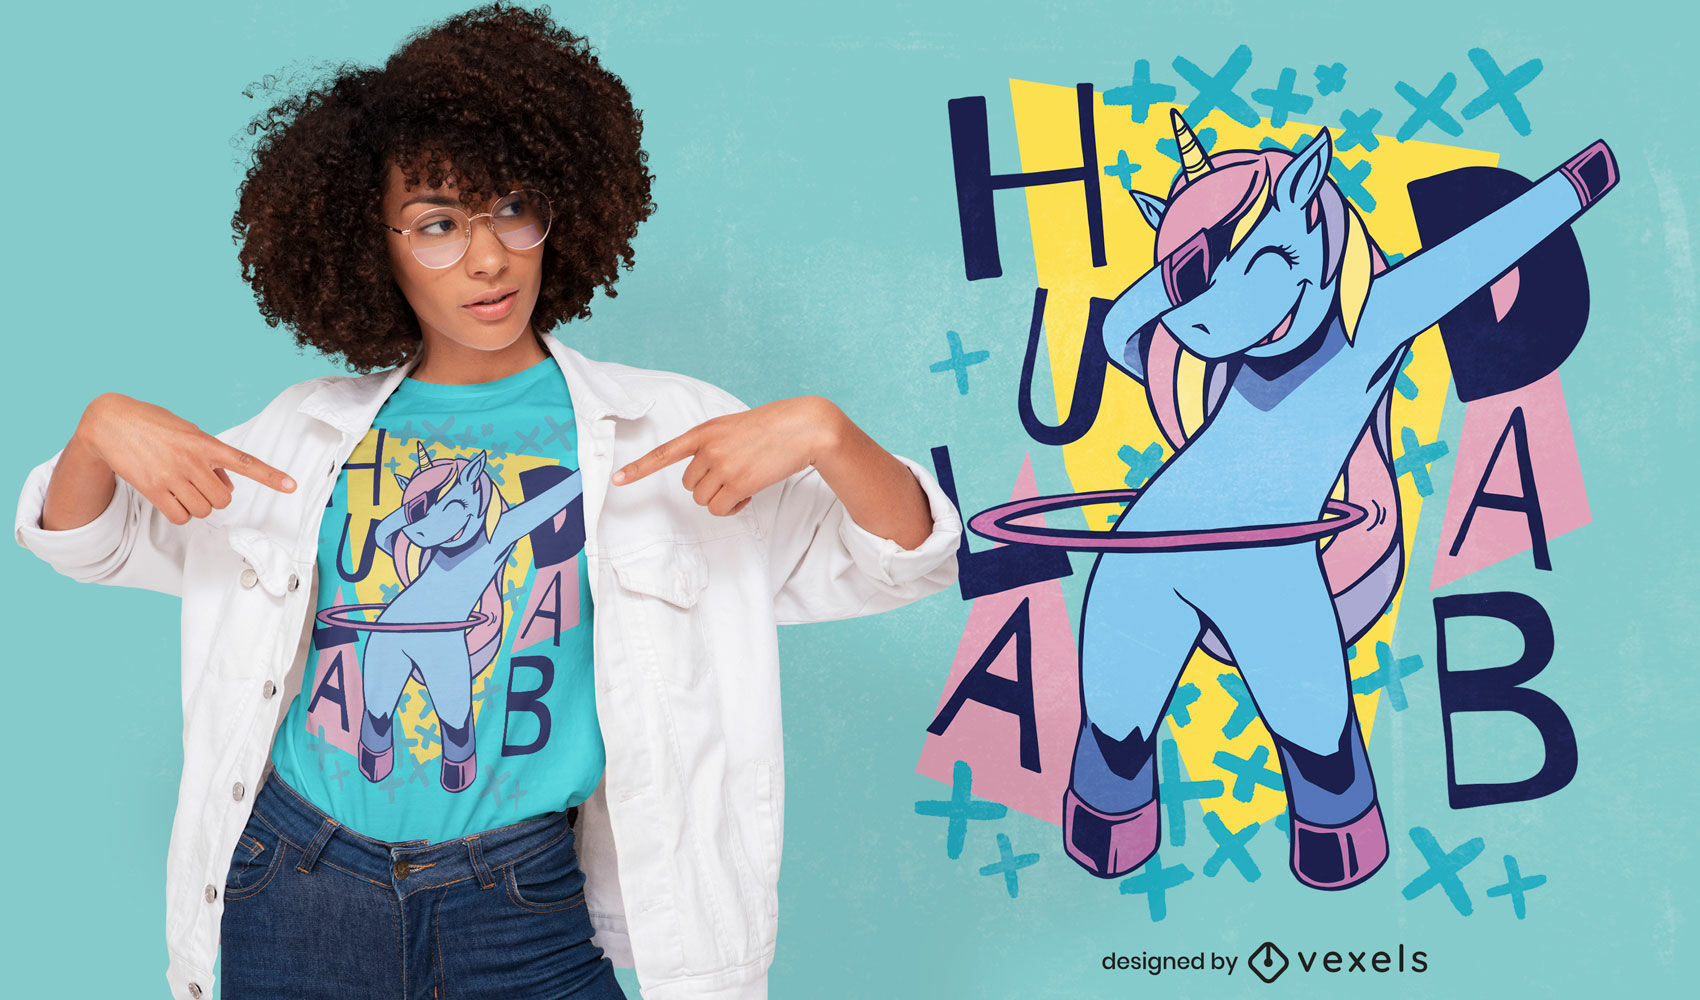 Dise?o de camiseta unicornio hula hooping dab